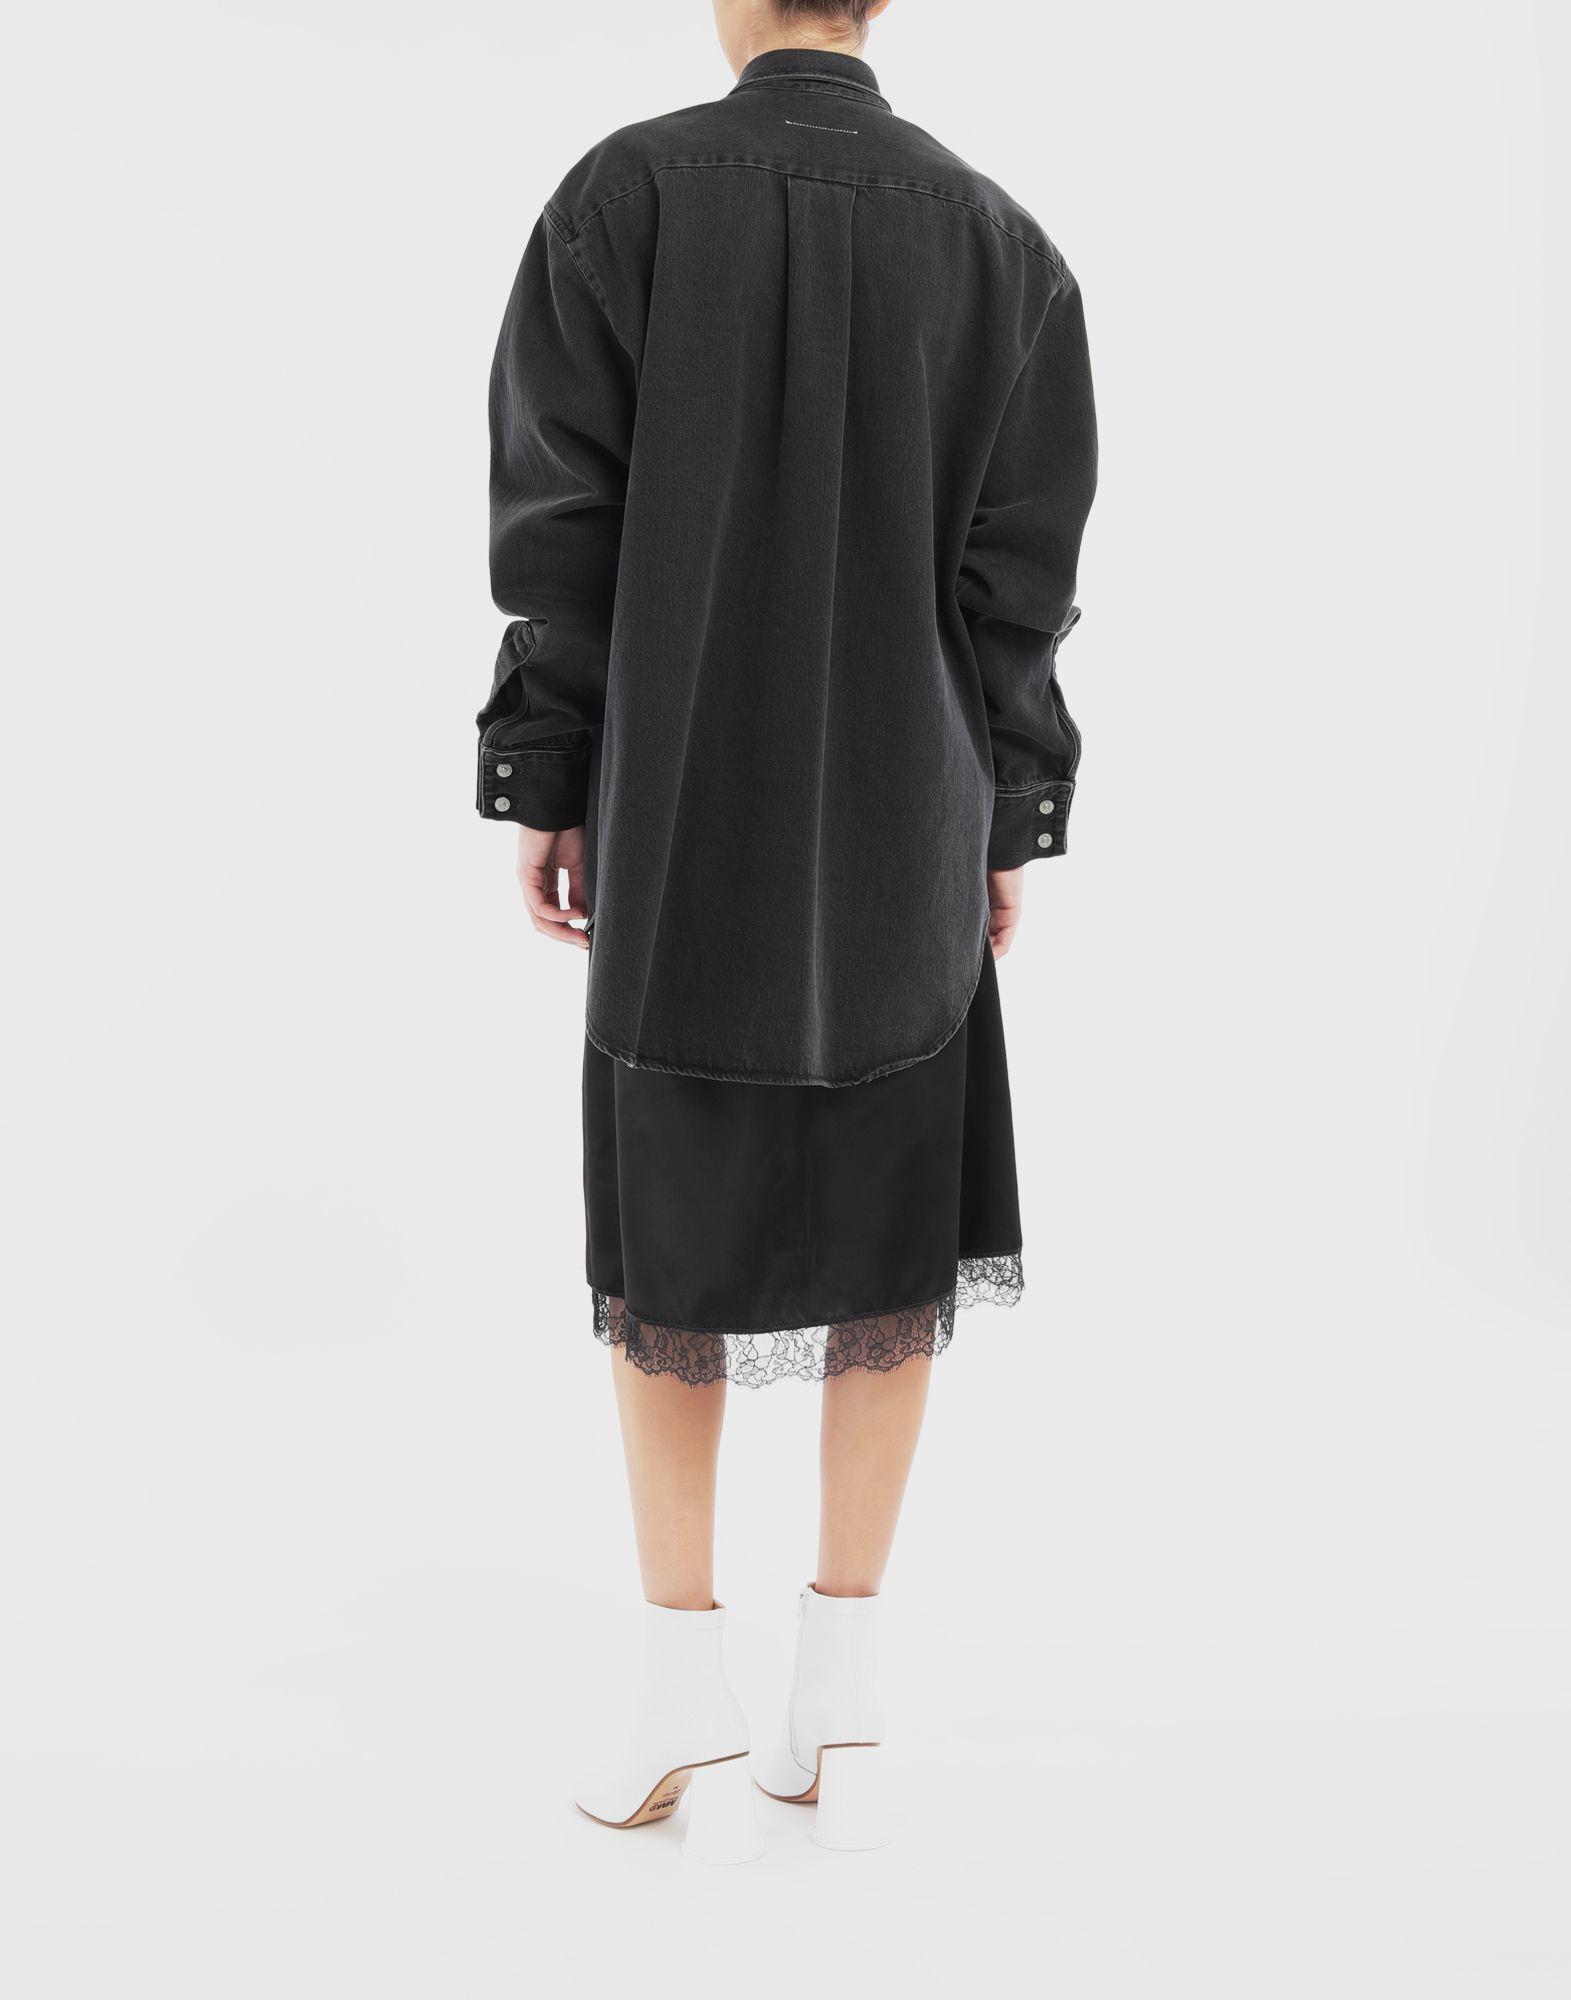 MM6 MAISON MARGIELA Multi-wear spliced shirt-dress Dress Woman e